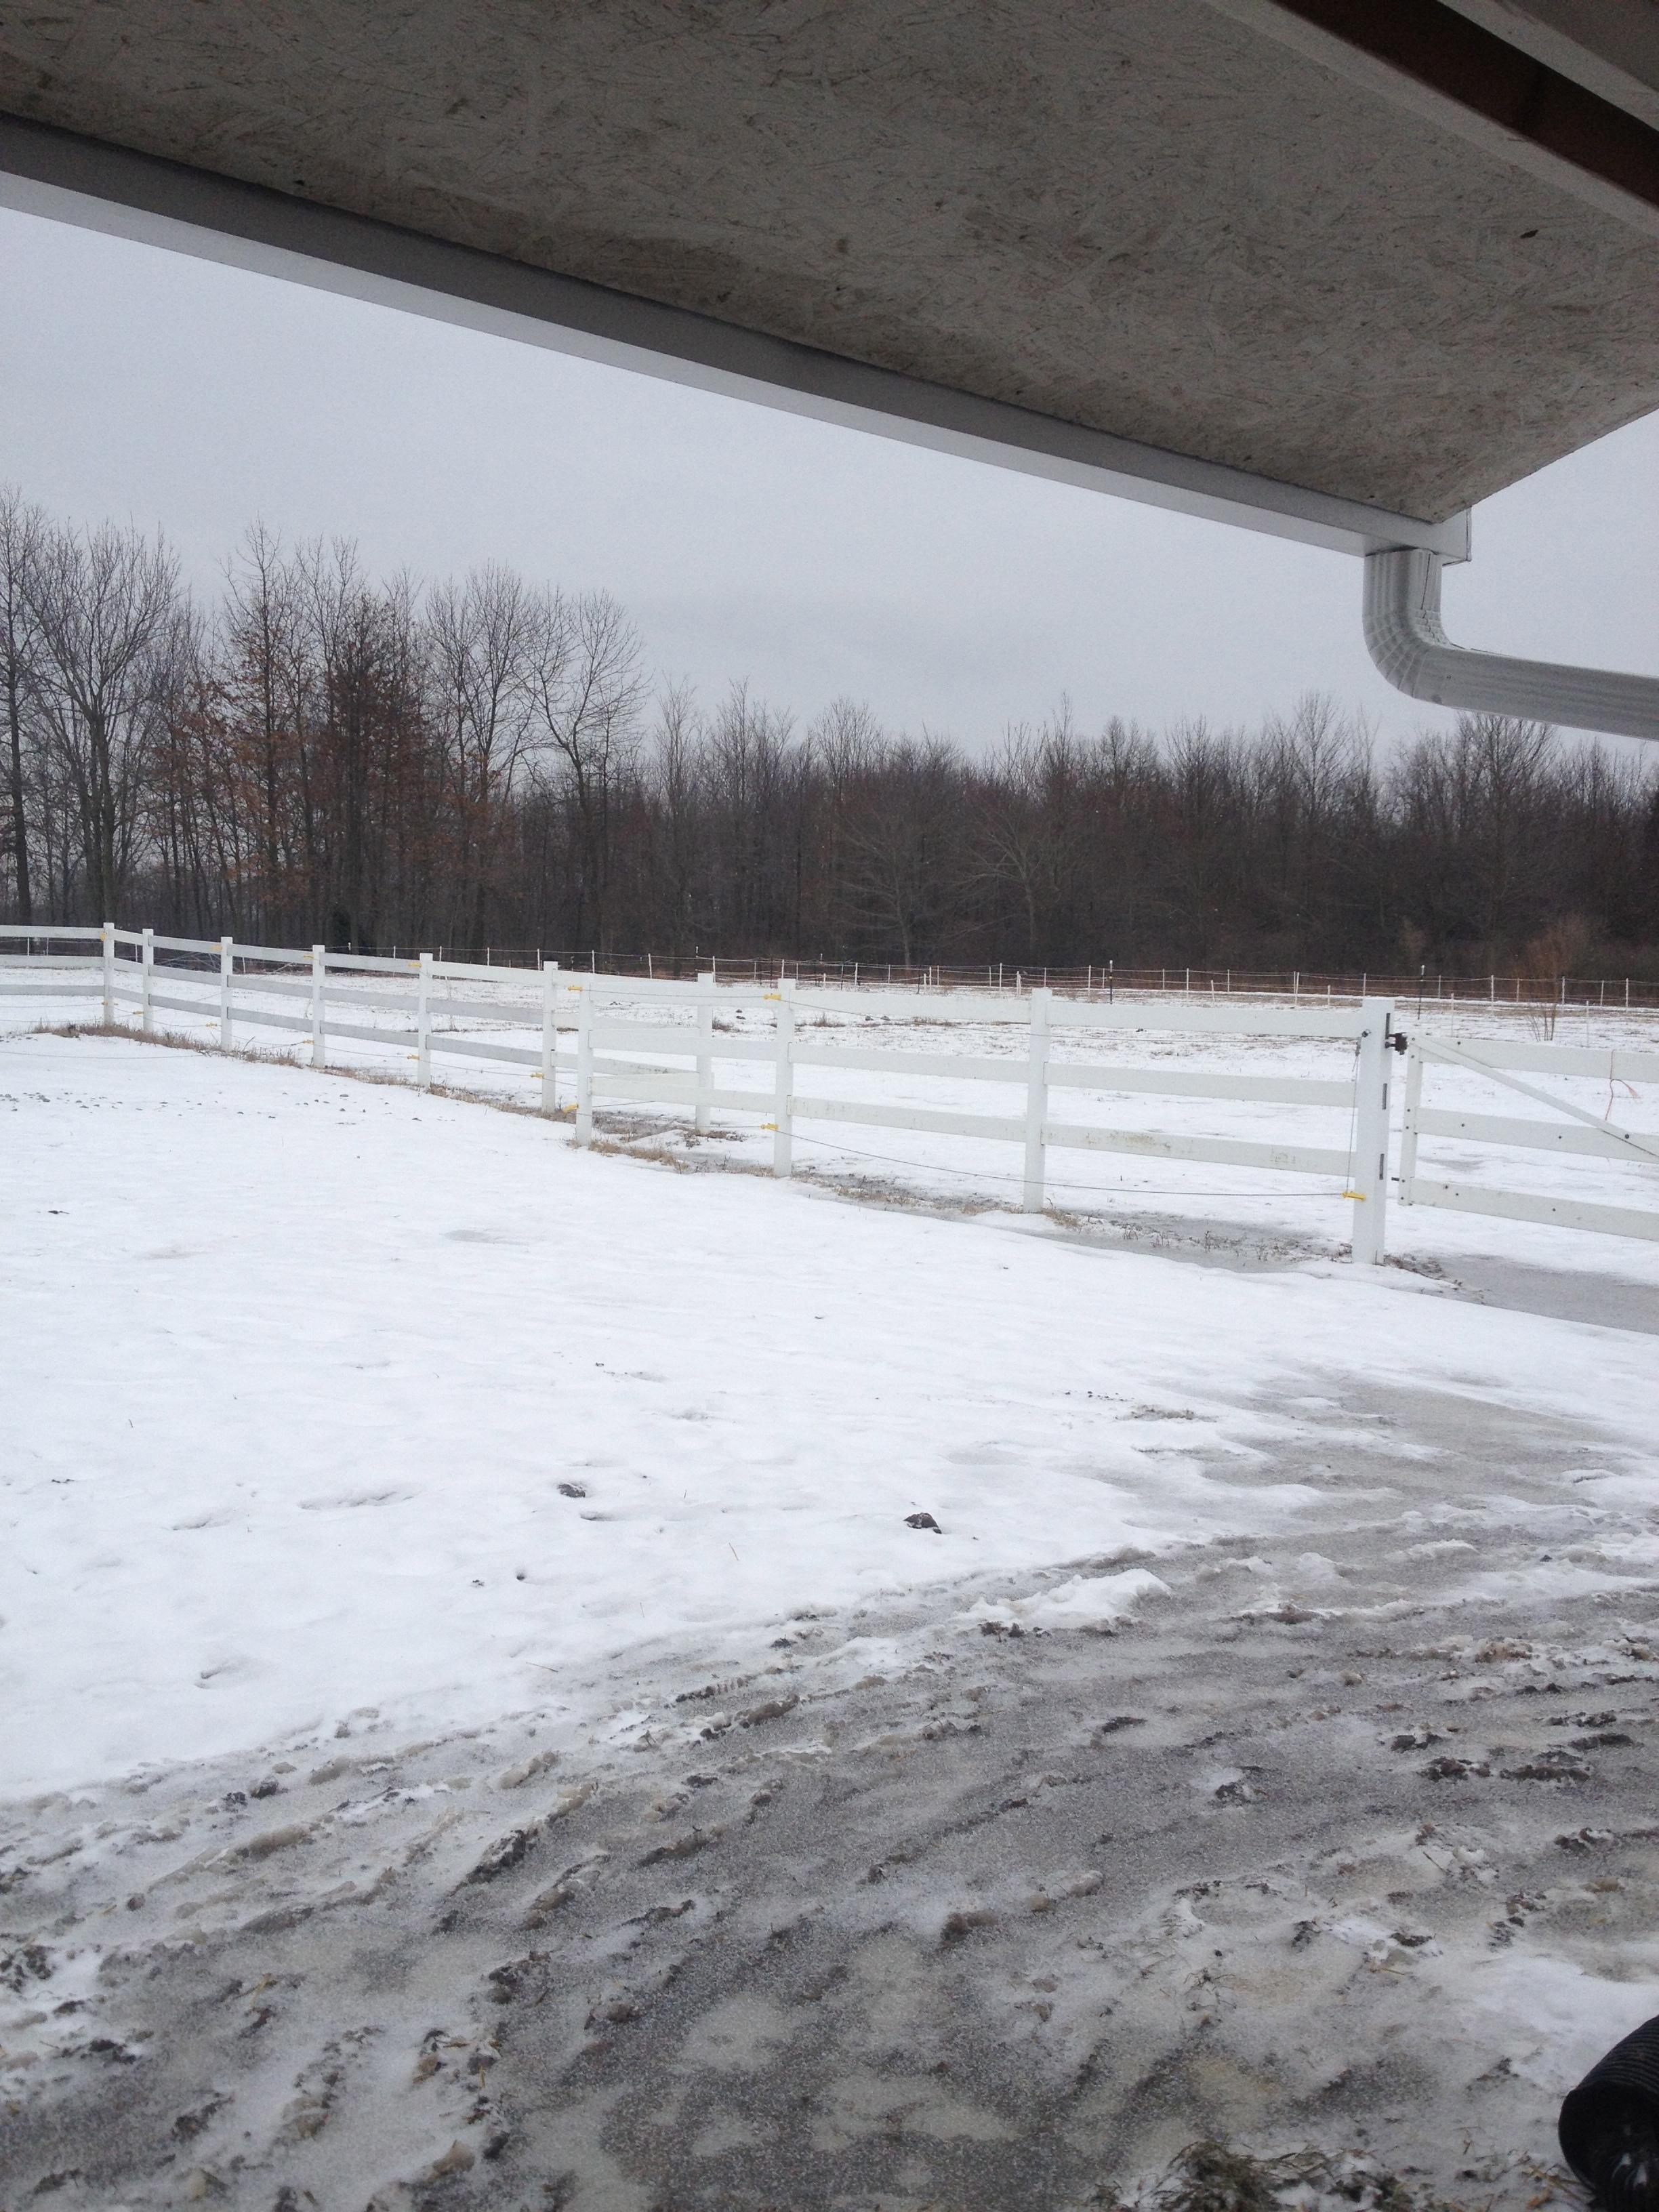 Pastures of snow